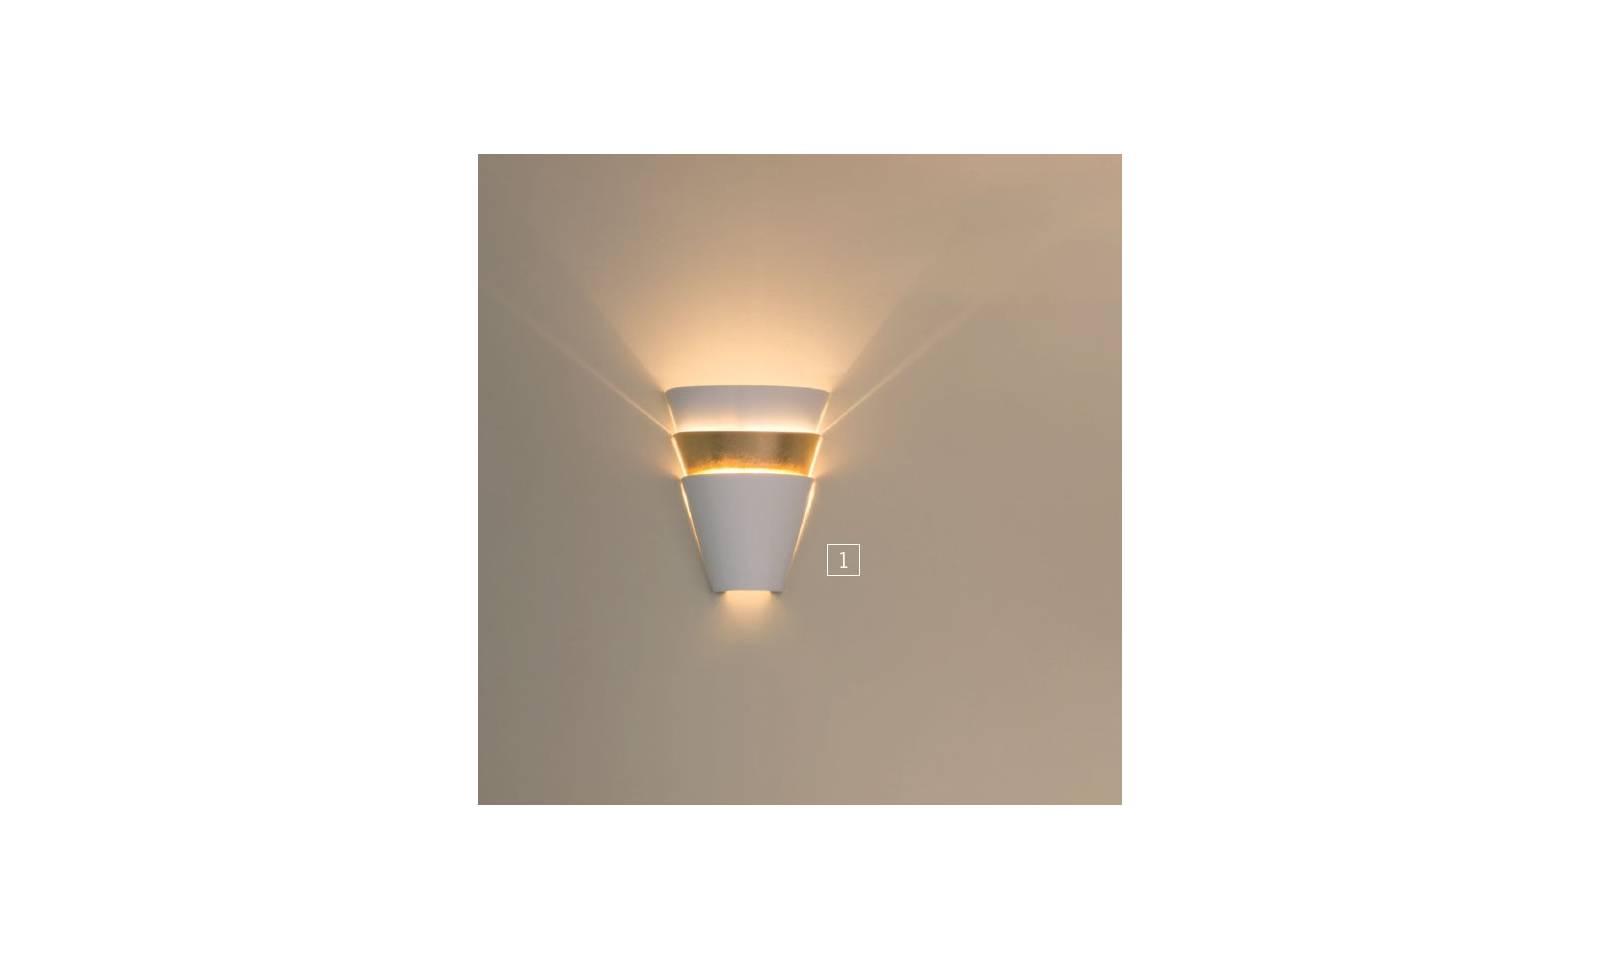 Platinlux applique serie vanessa luce in metallo bianco oro